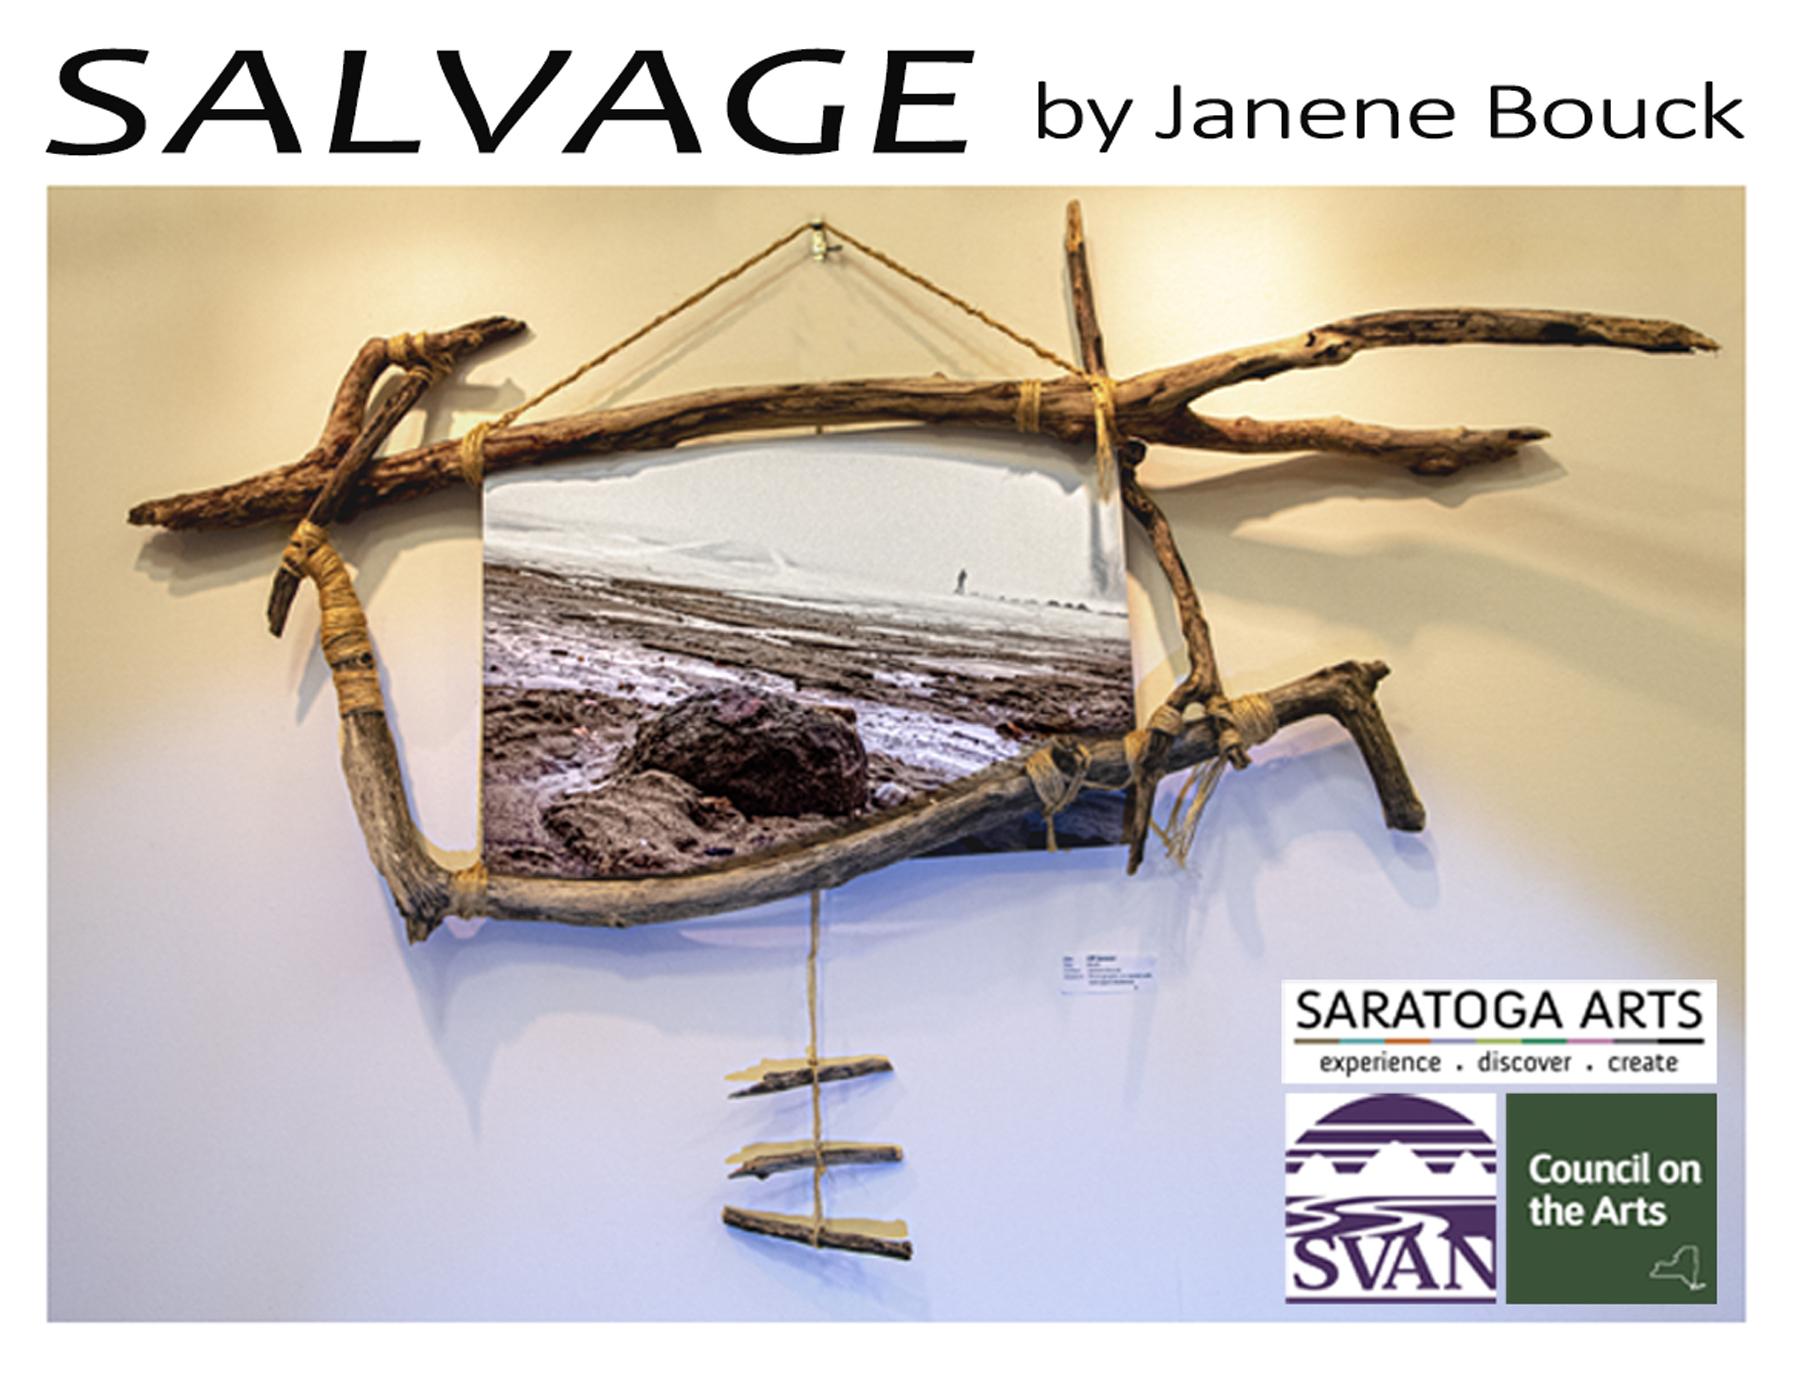 SALVAGE Image for Print Ads 5x7 300ppi.jpg